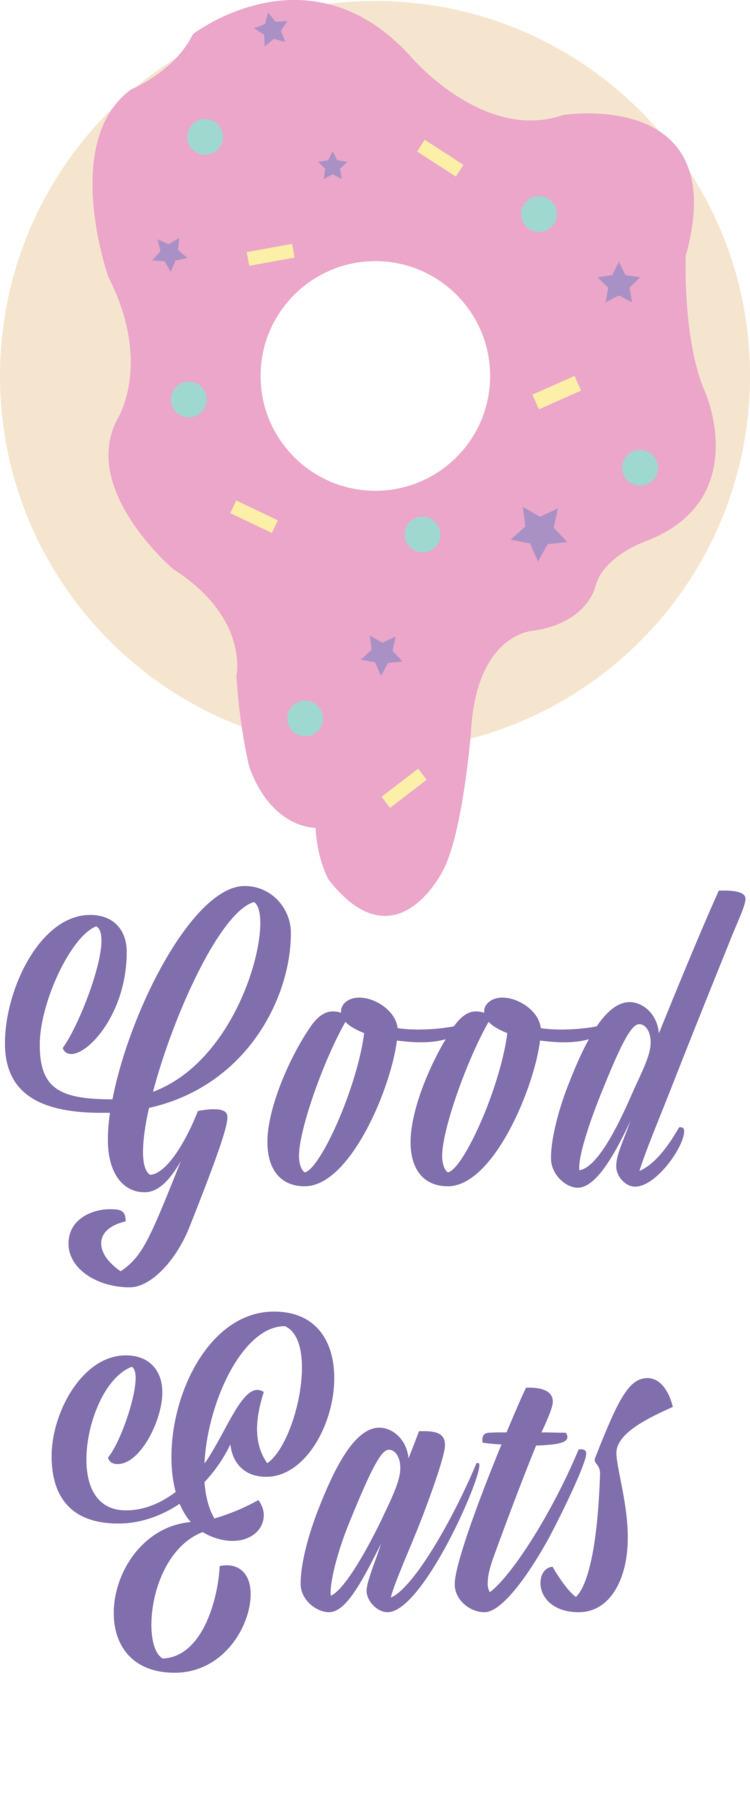 Good Eats Donut designs Sweet B - sdreynolds   ello